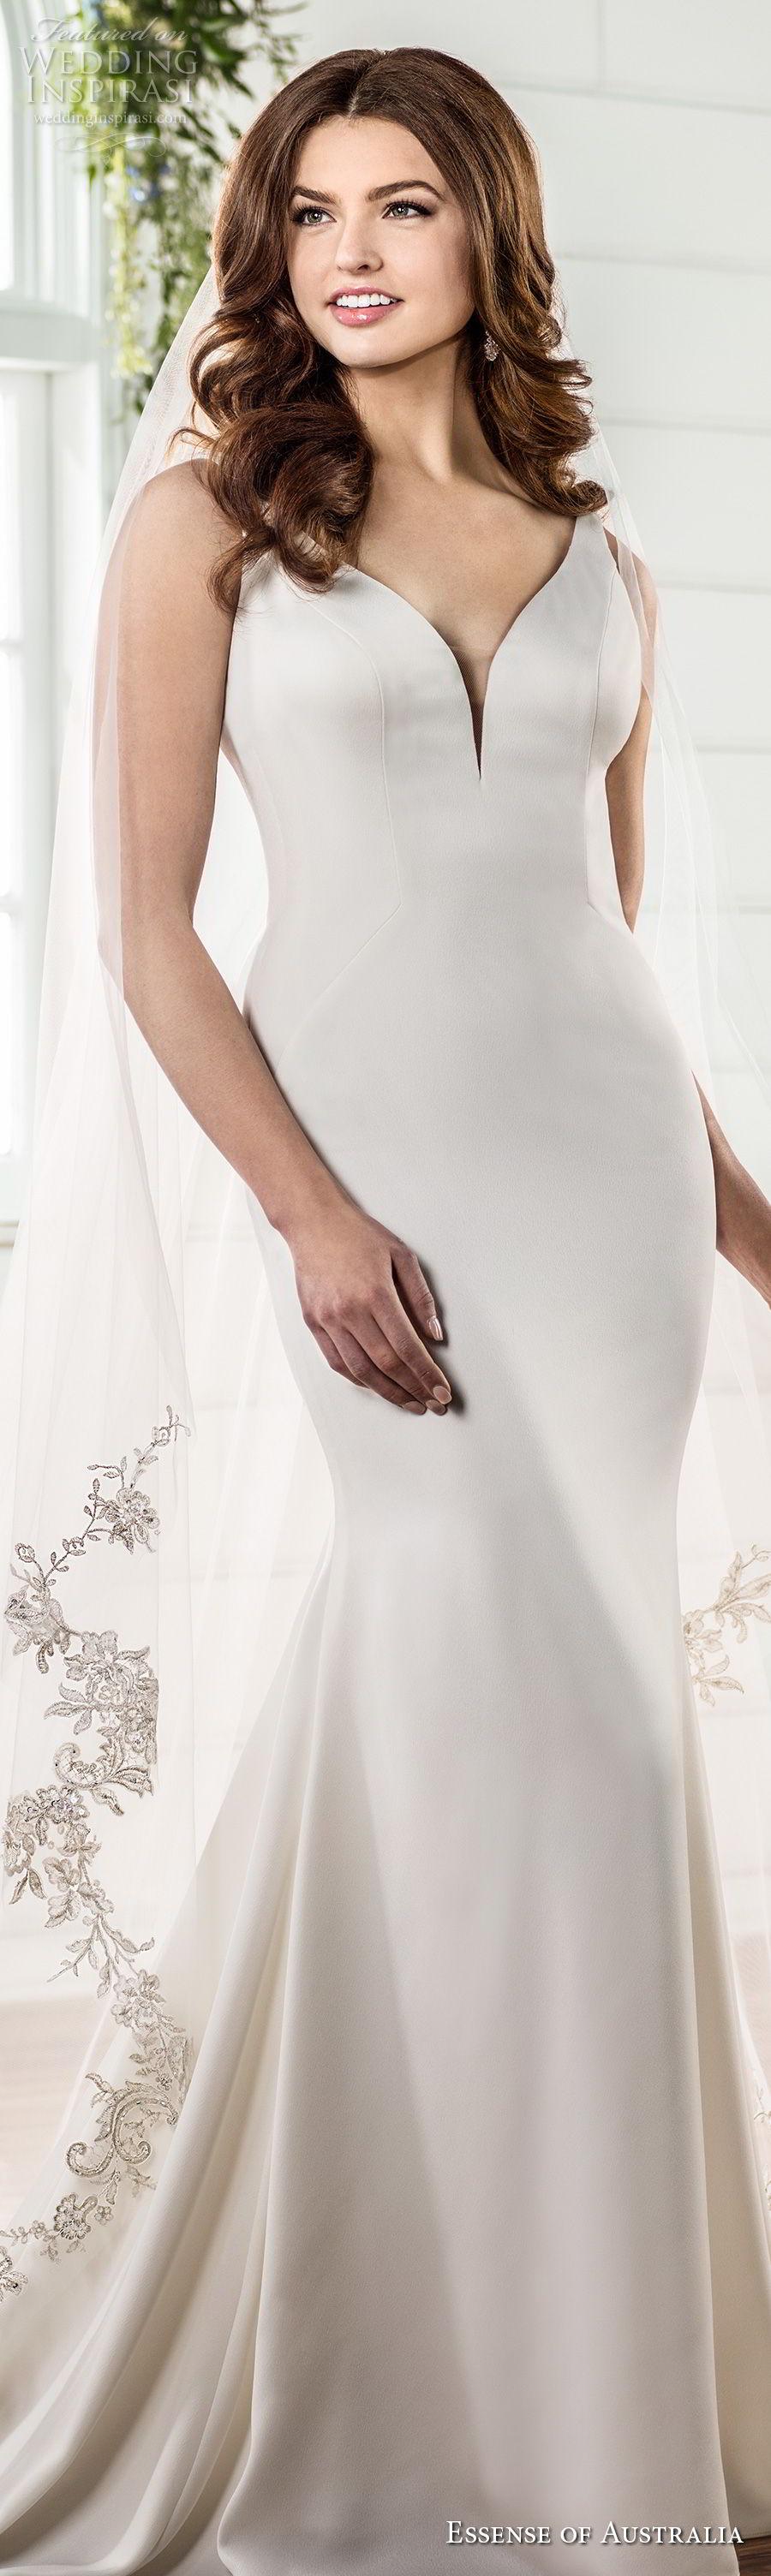 essense australia fall 2017 bridal sleeveless v neck simple clean elegant fit and flare sheath wedding dress low open back  medium train (78) lv